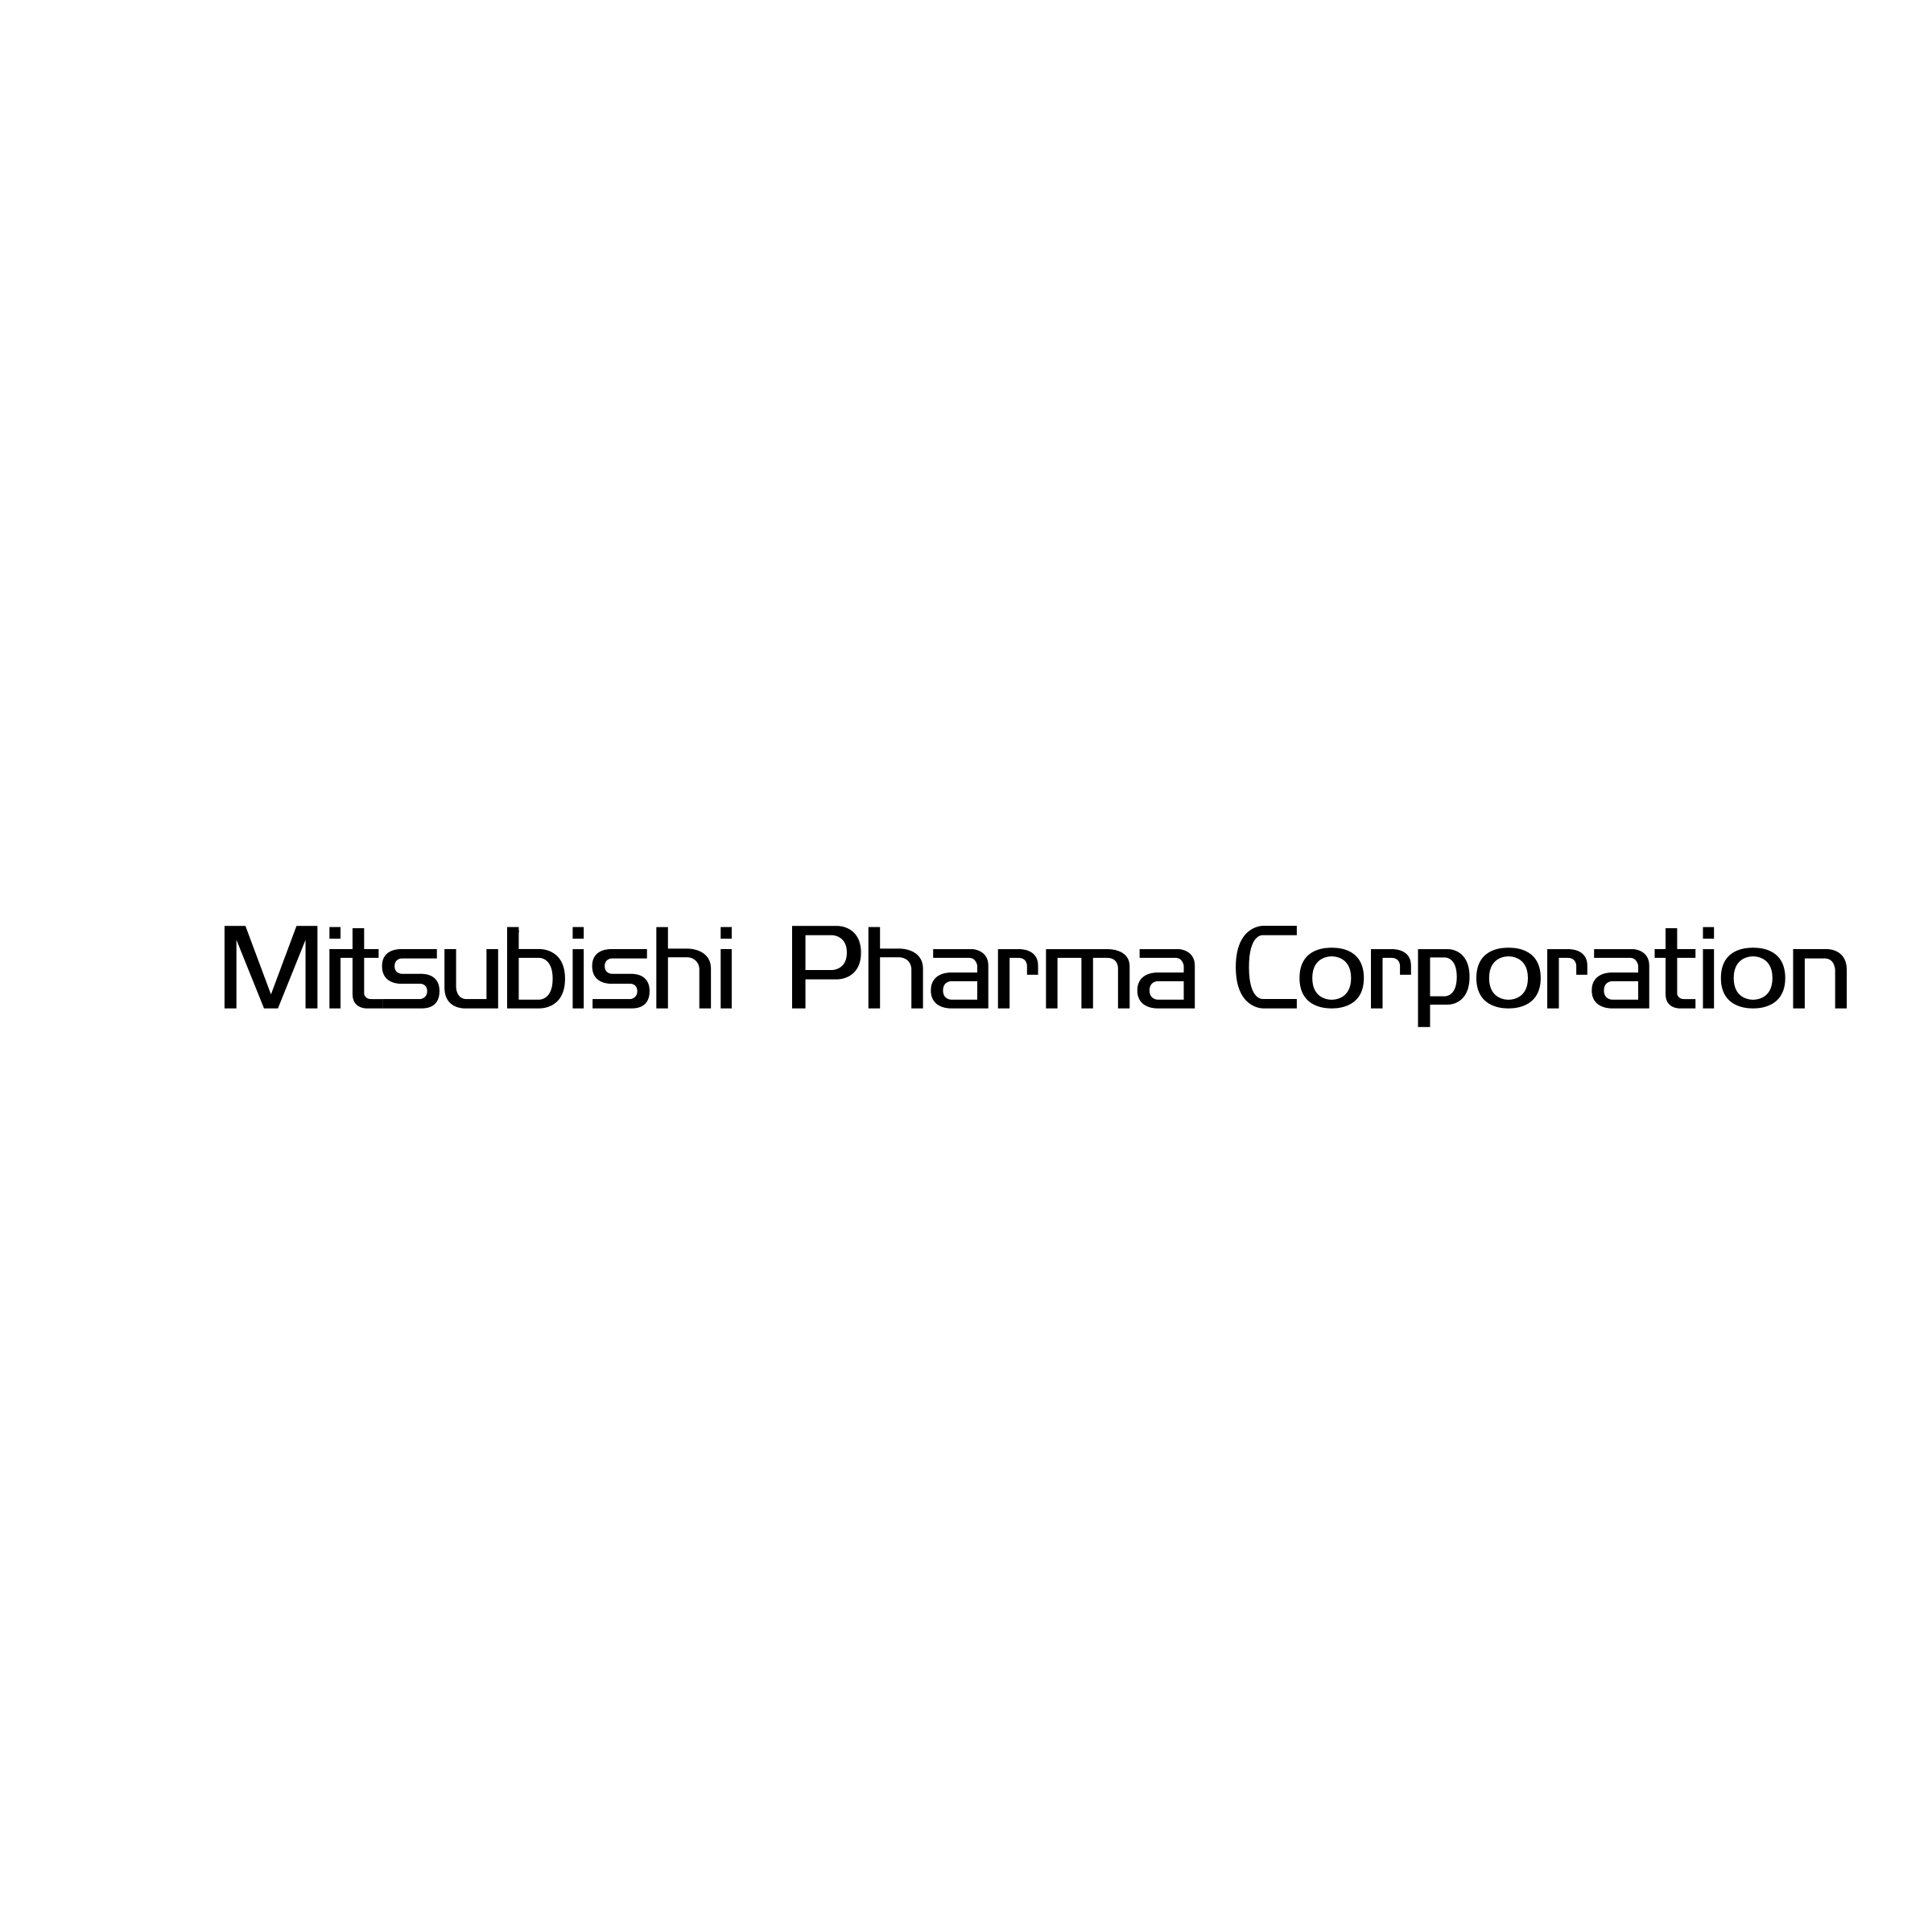 Mitsubishi Pharma Corporation Logo PNG Transparent & SVG Vector